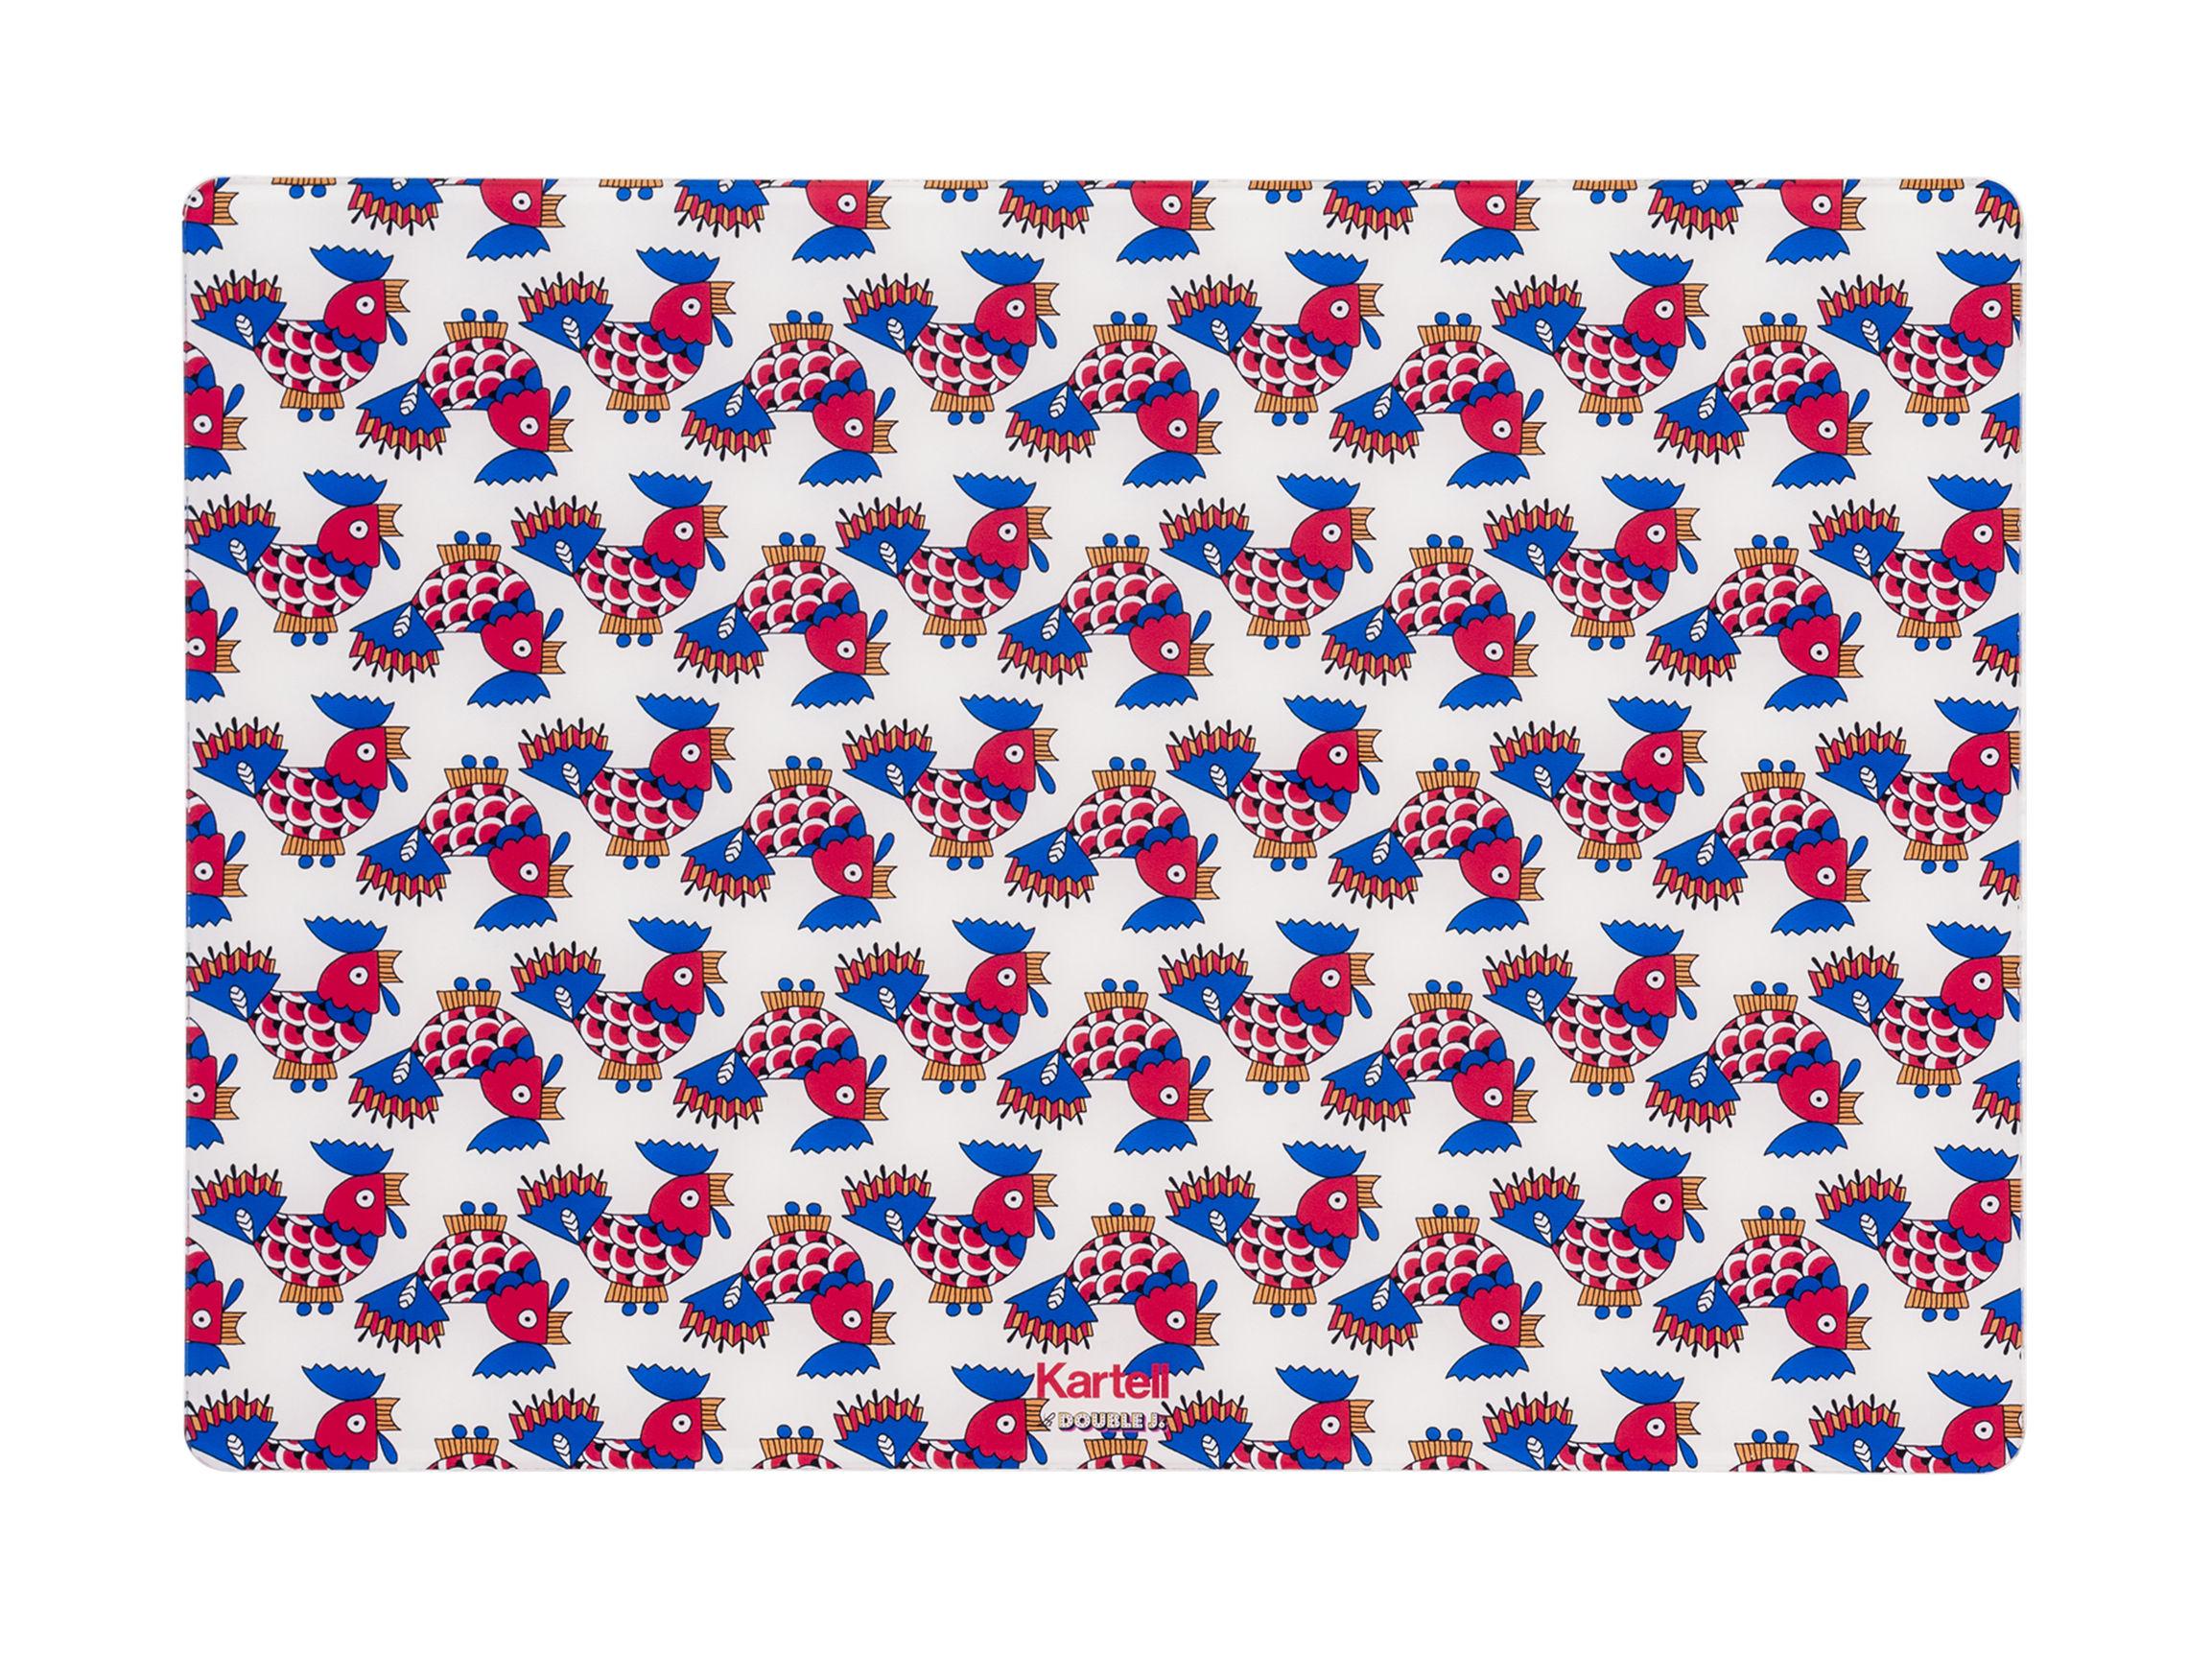 Mantel rígido L'Americana La Double J - / 42 x 30 cm - Galletti Kartell La Double J 1